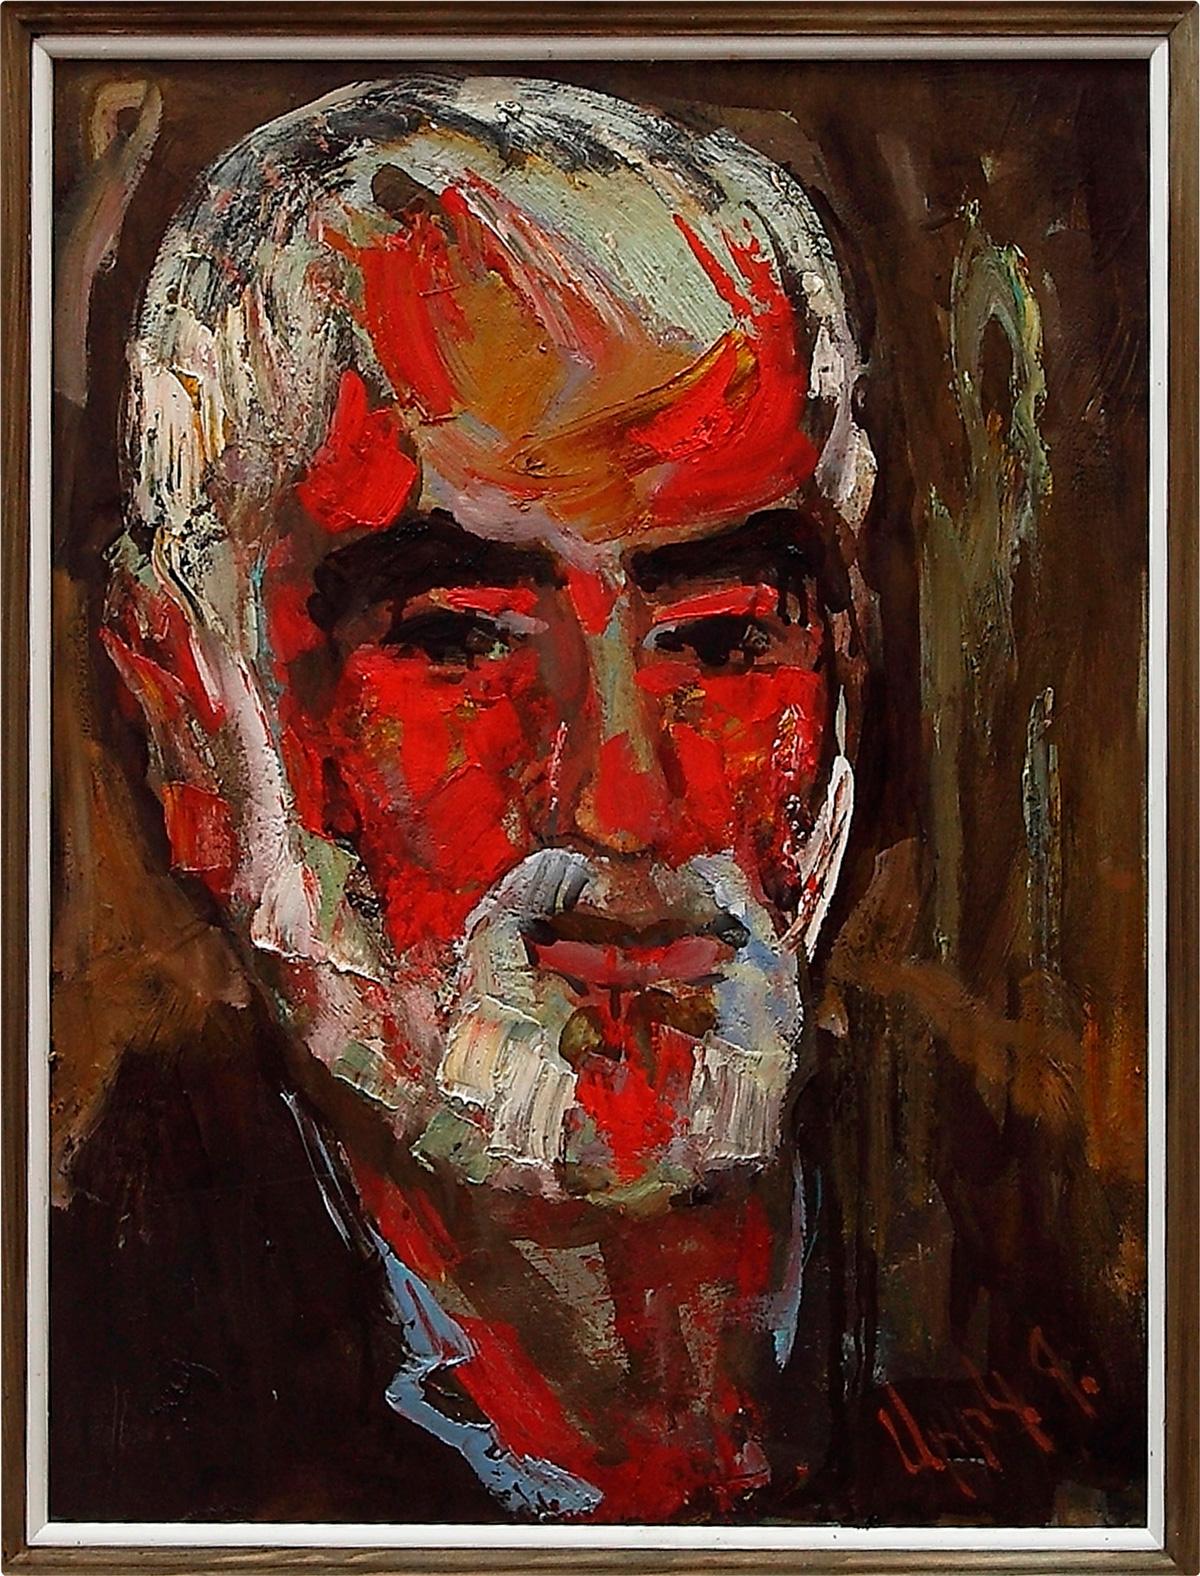 Артюша 2014 52х41 орг - Portrait of Artyush, 52x41, oil on faberboard, 2014